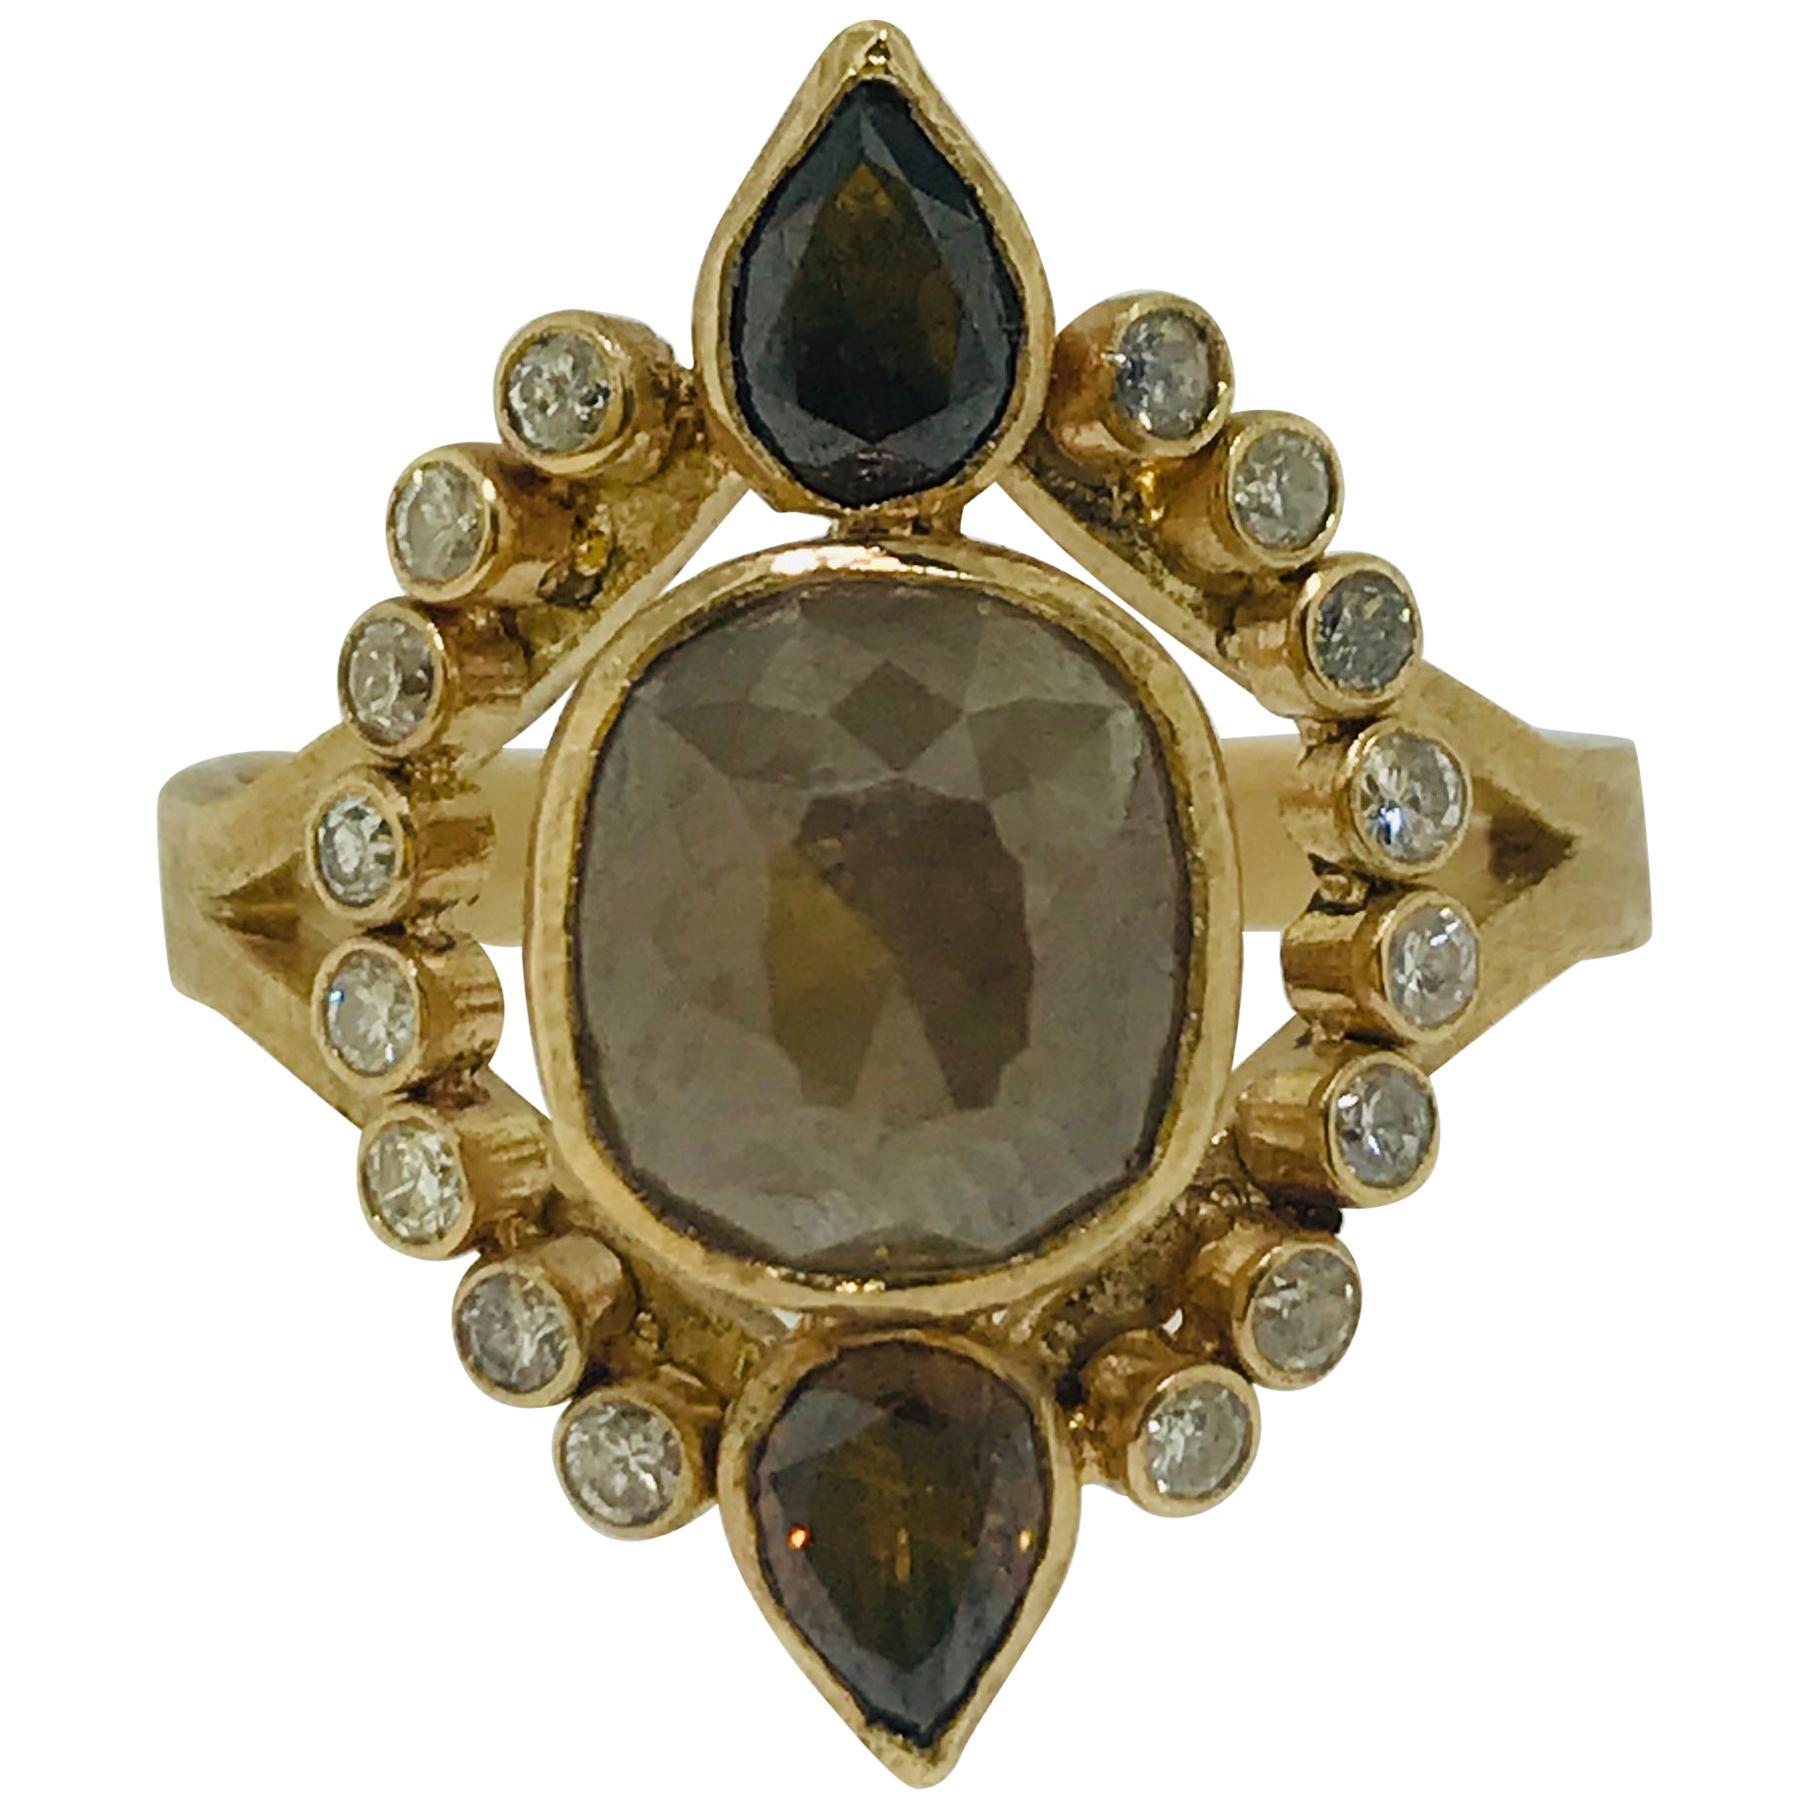 Rough Diamond Ring, 4 Carat Champagne Diamond Engagement Ring, Original Design